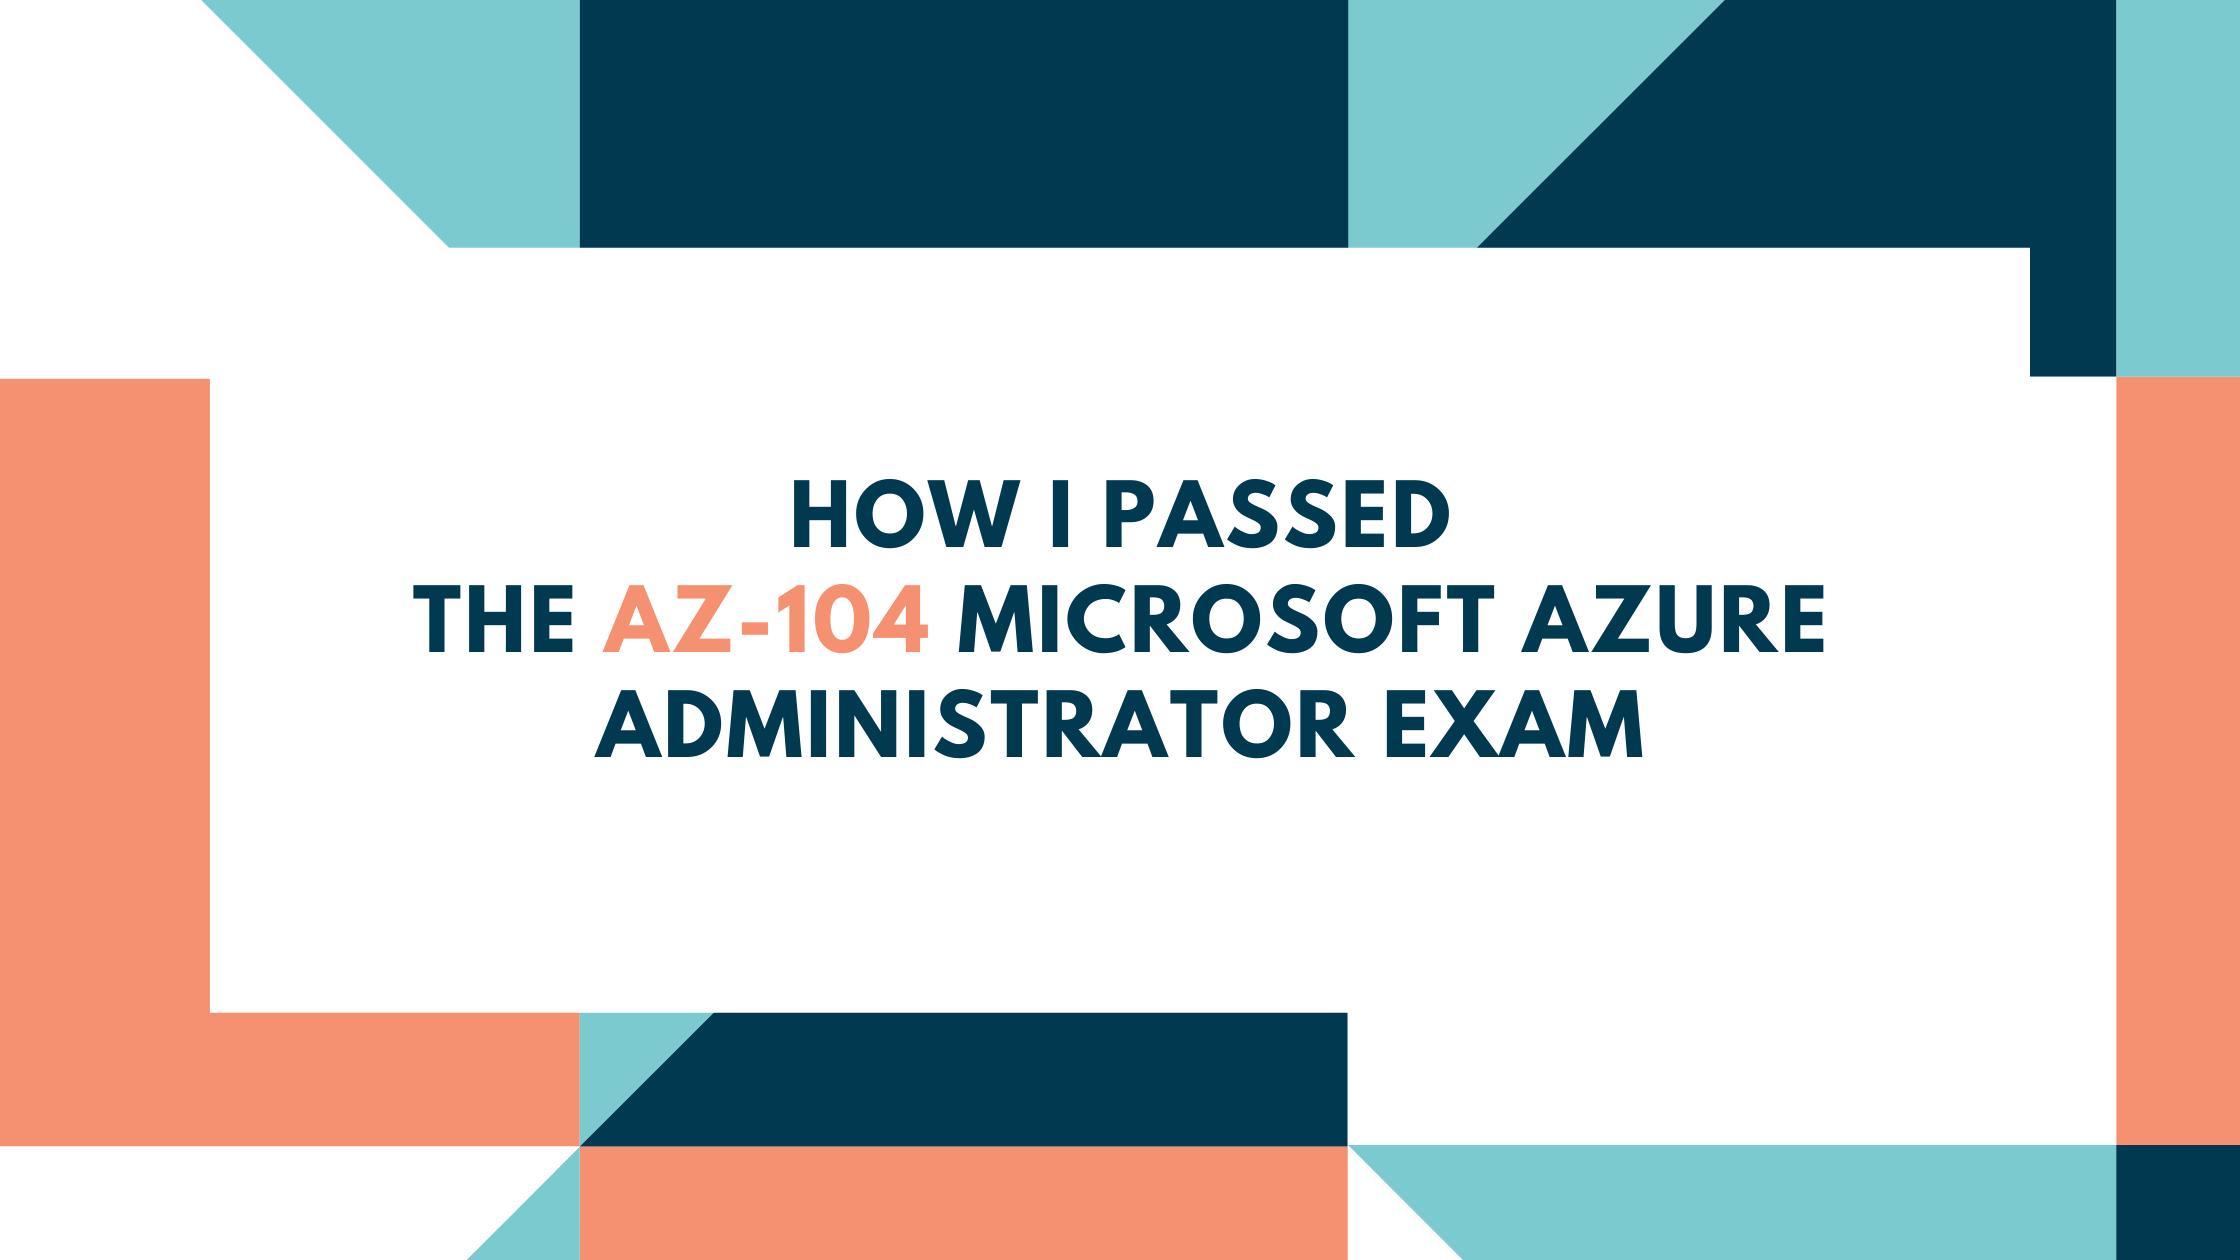 How I Passed the AZ-104 Microsoft Azure Administrator Exam